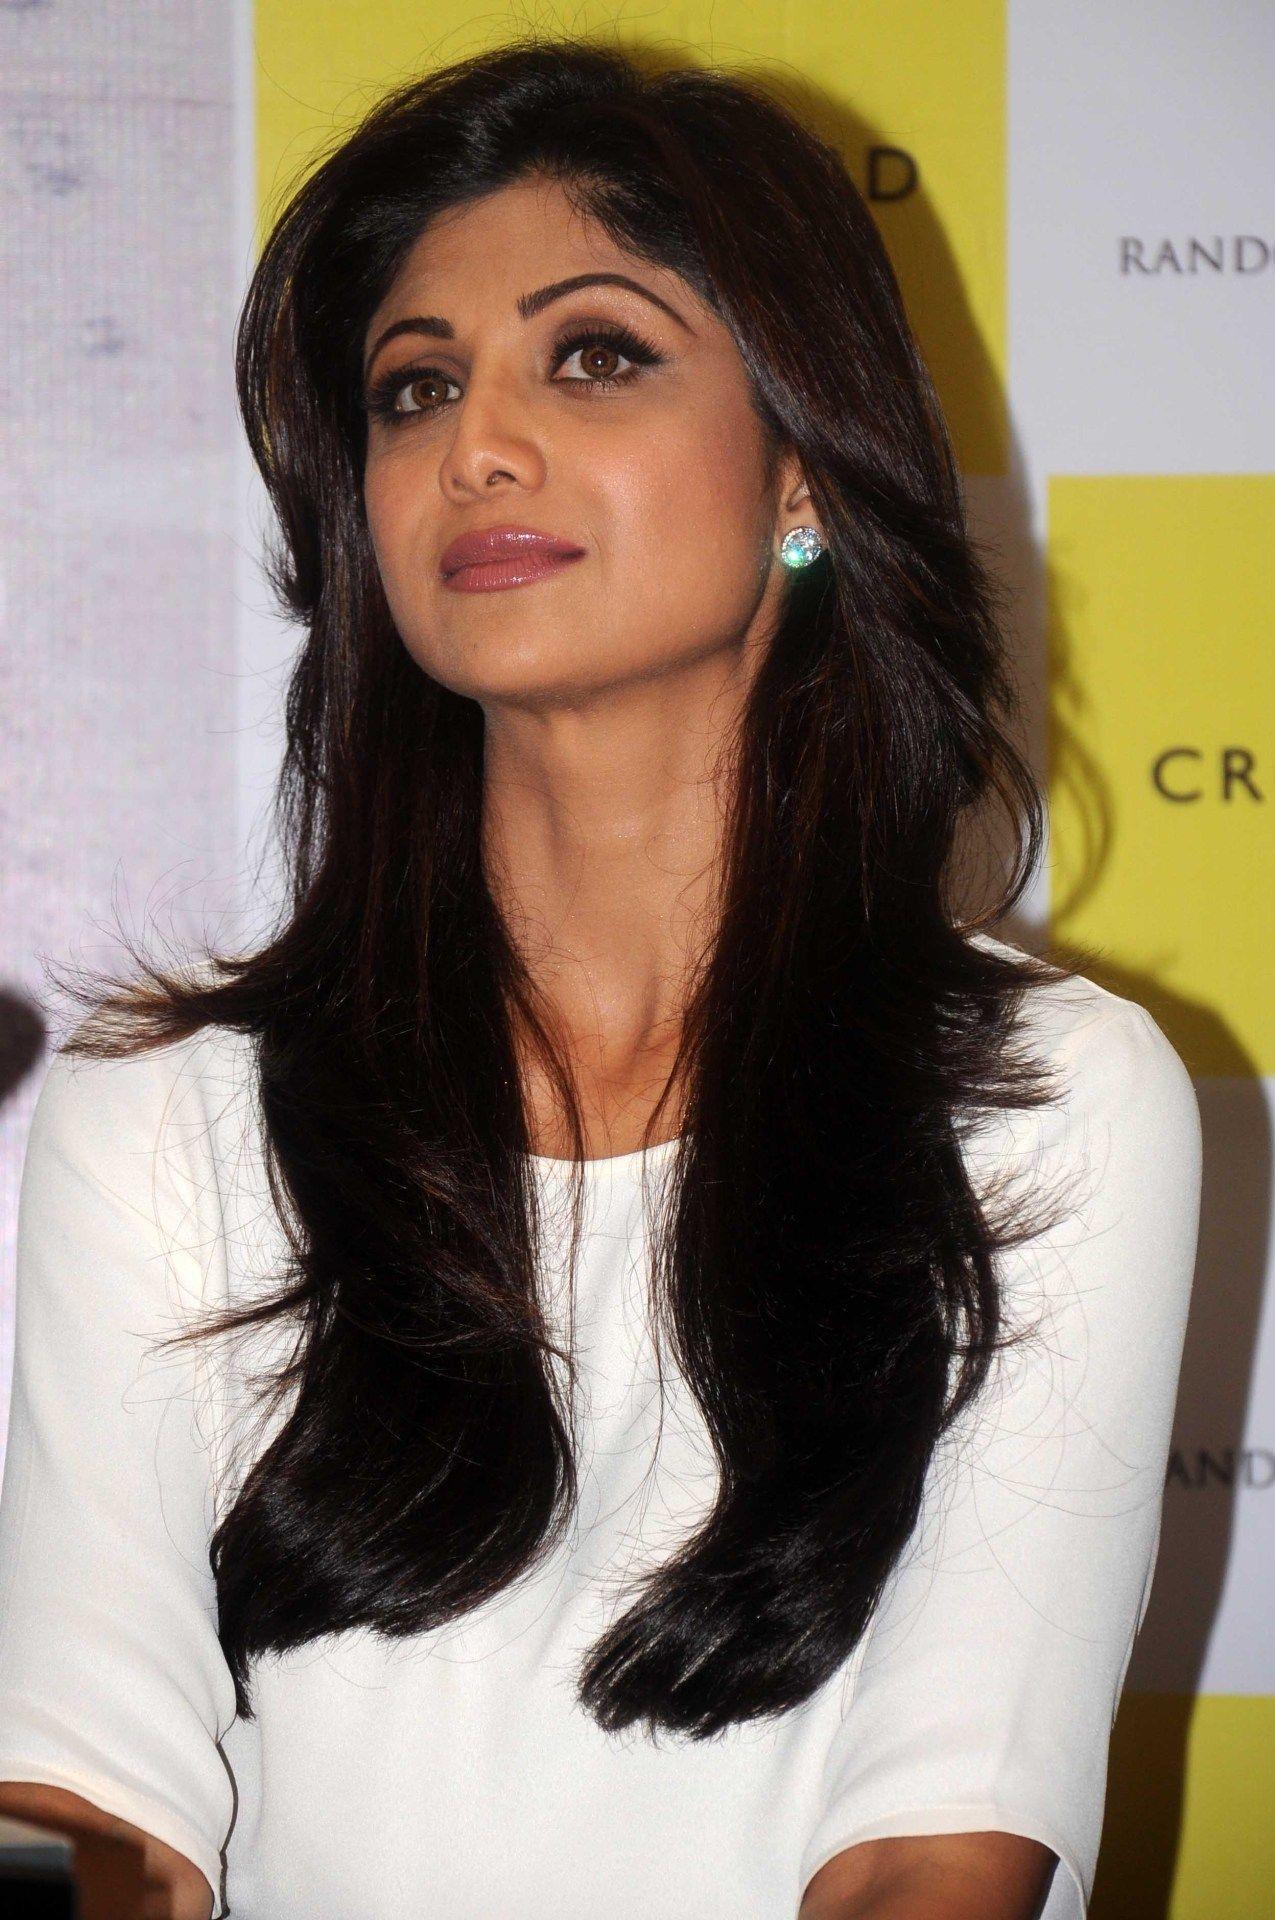 Shilpa Shetty Beauty Bollywood Hairstyles Hair Care Regimen